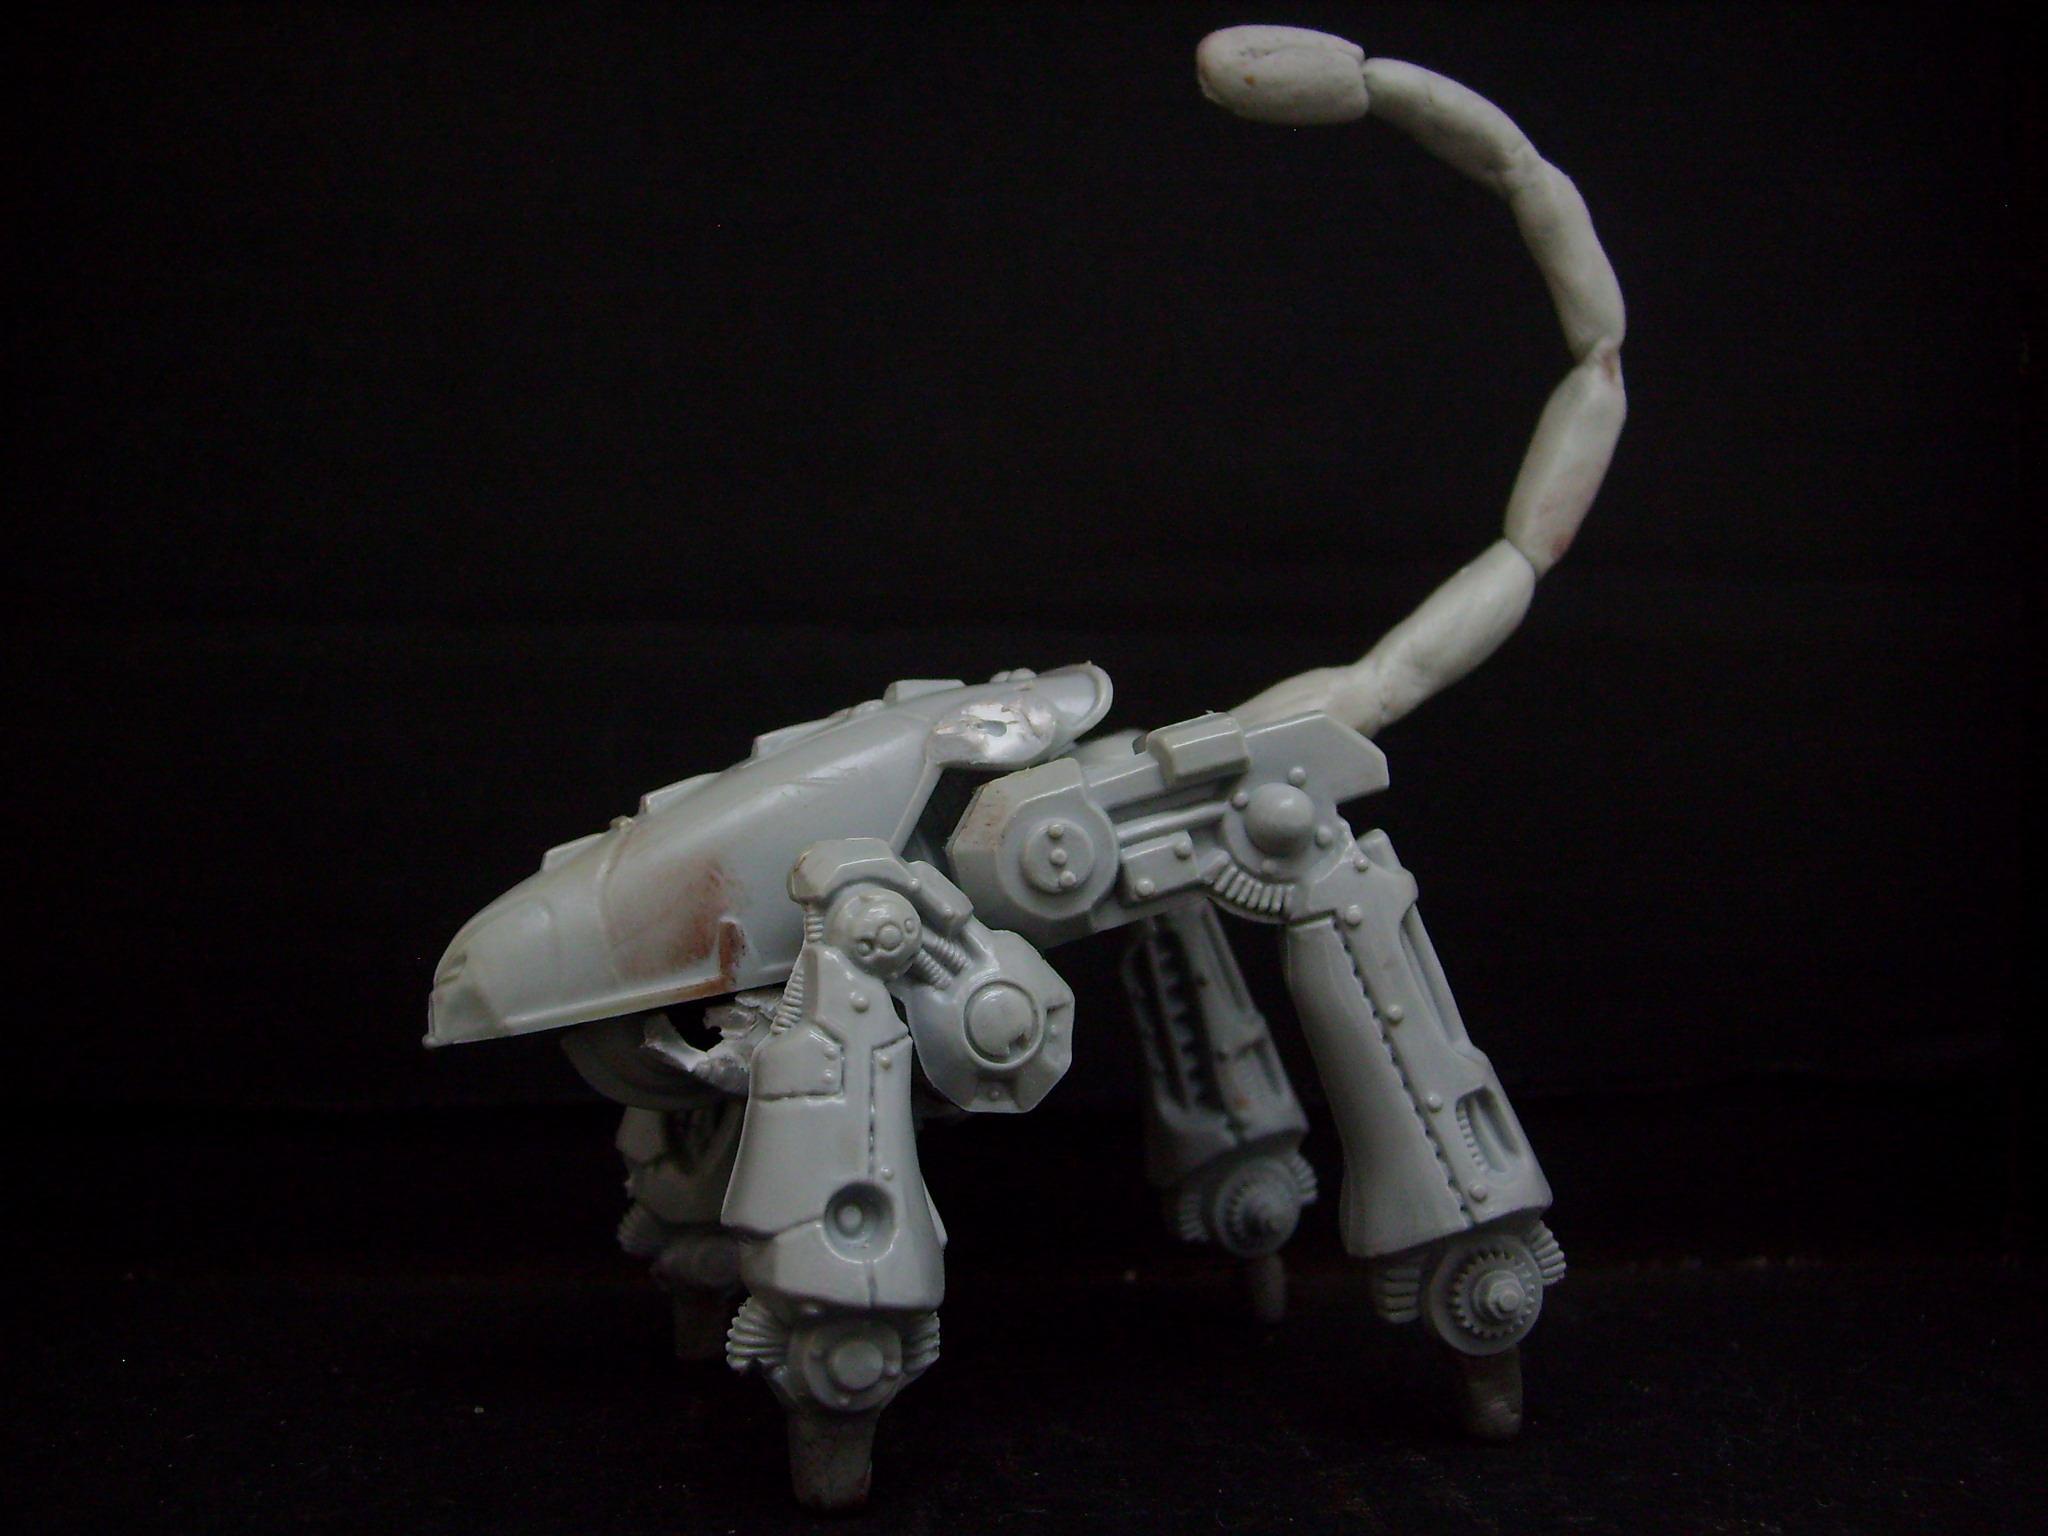 Dreadnought, Scorpion